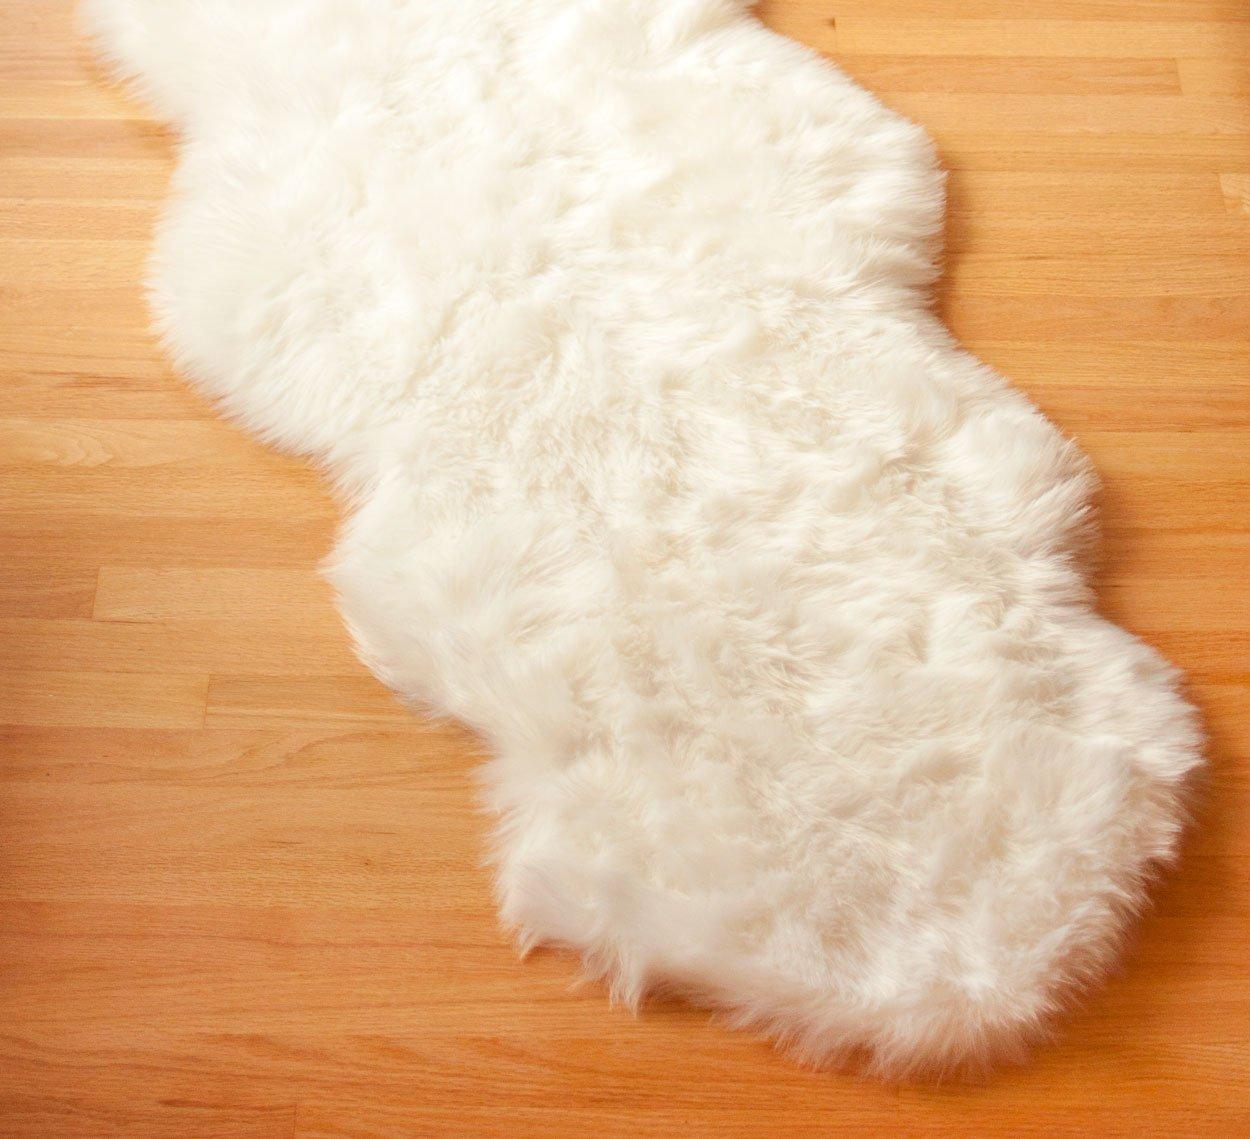 UltraPlush Faux Sheepskin Rug - Premium Quality Faux Fur Area Rug 2ft x 6ft - White ULTRAPlush Series